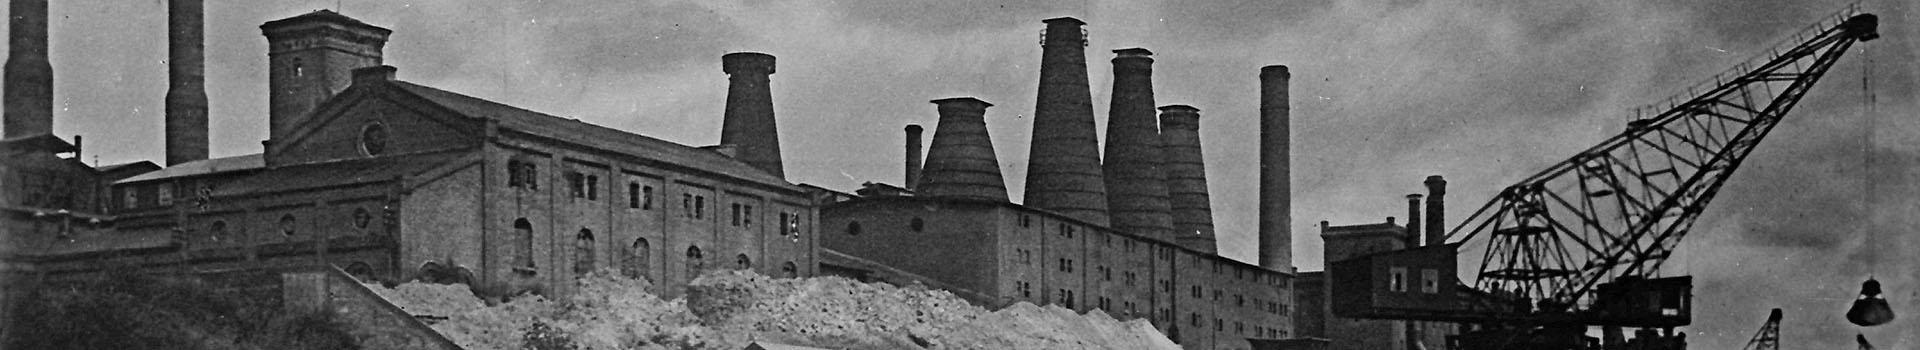 150 Jahre Bonner Portland-Zementwerk Oberkassel